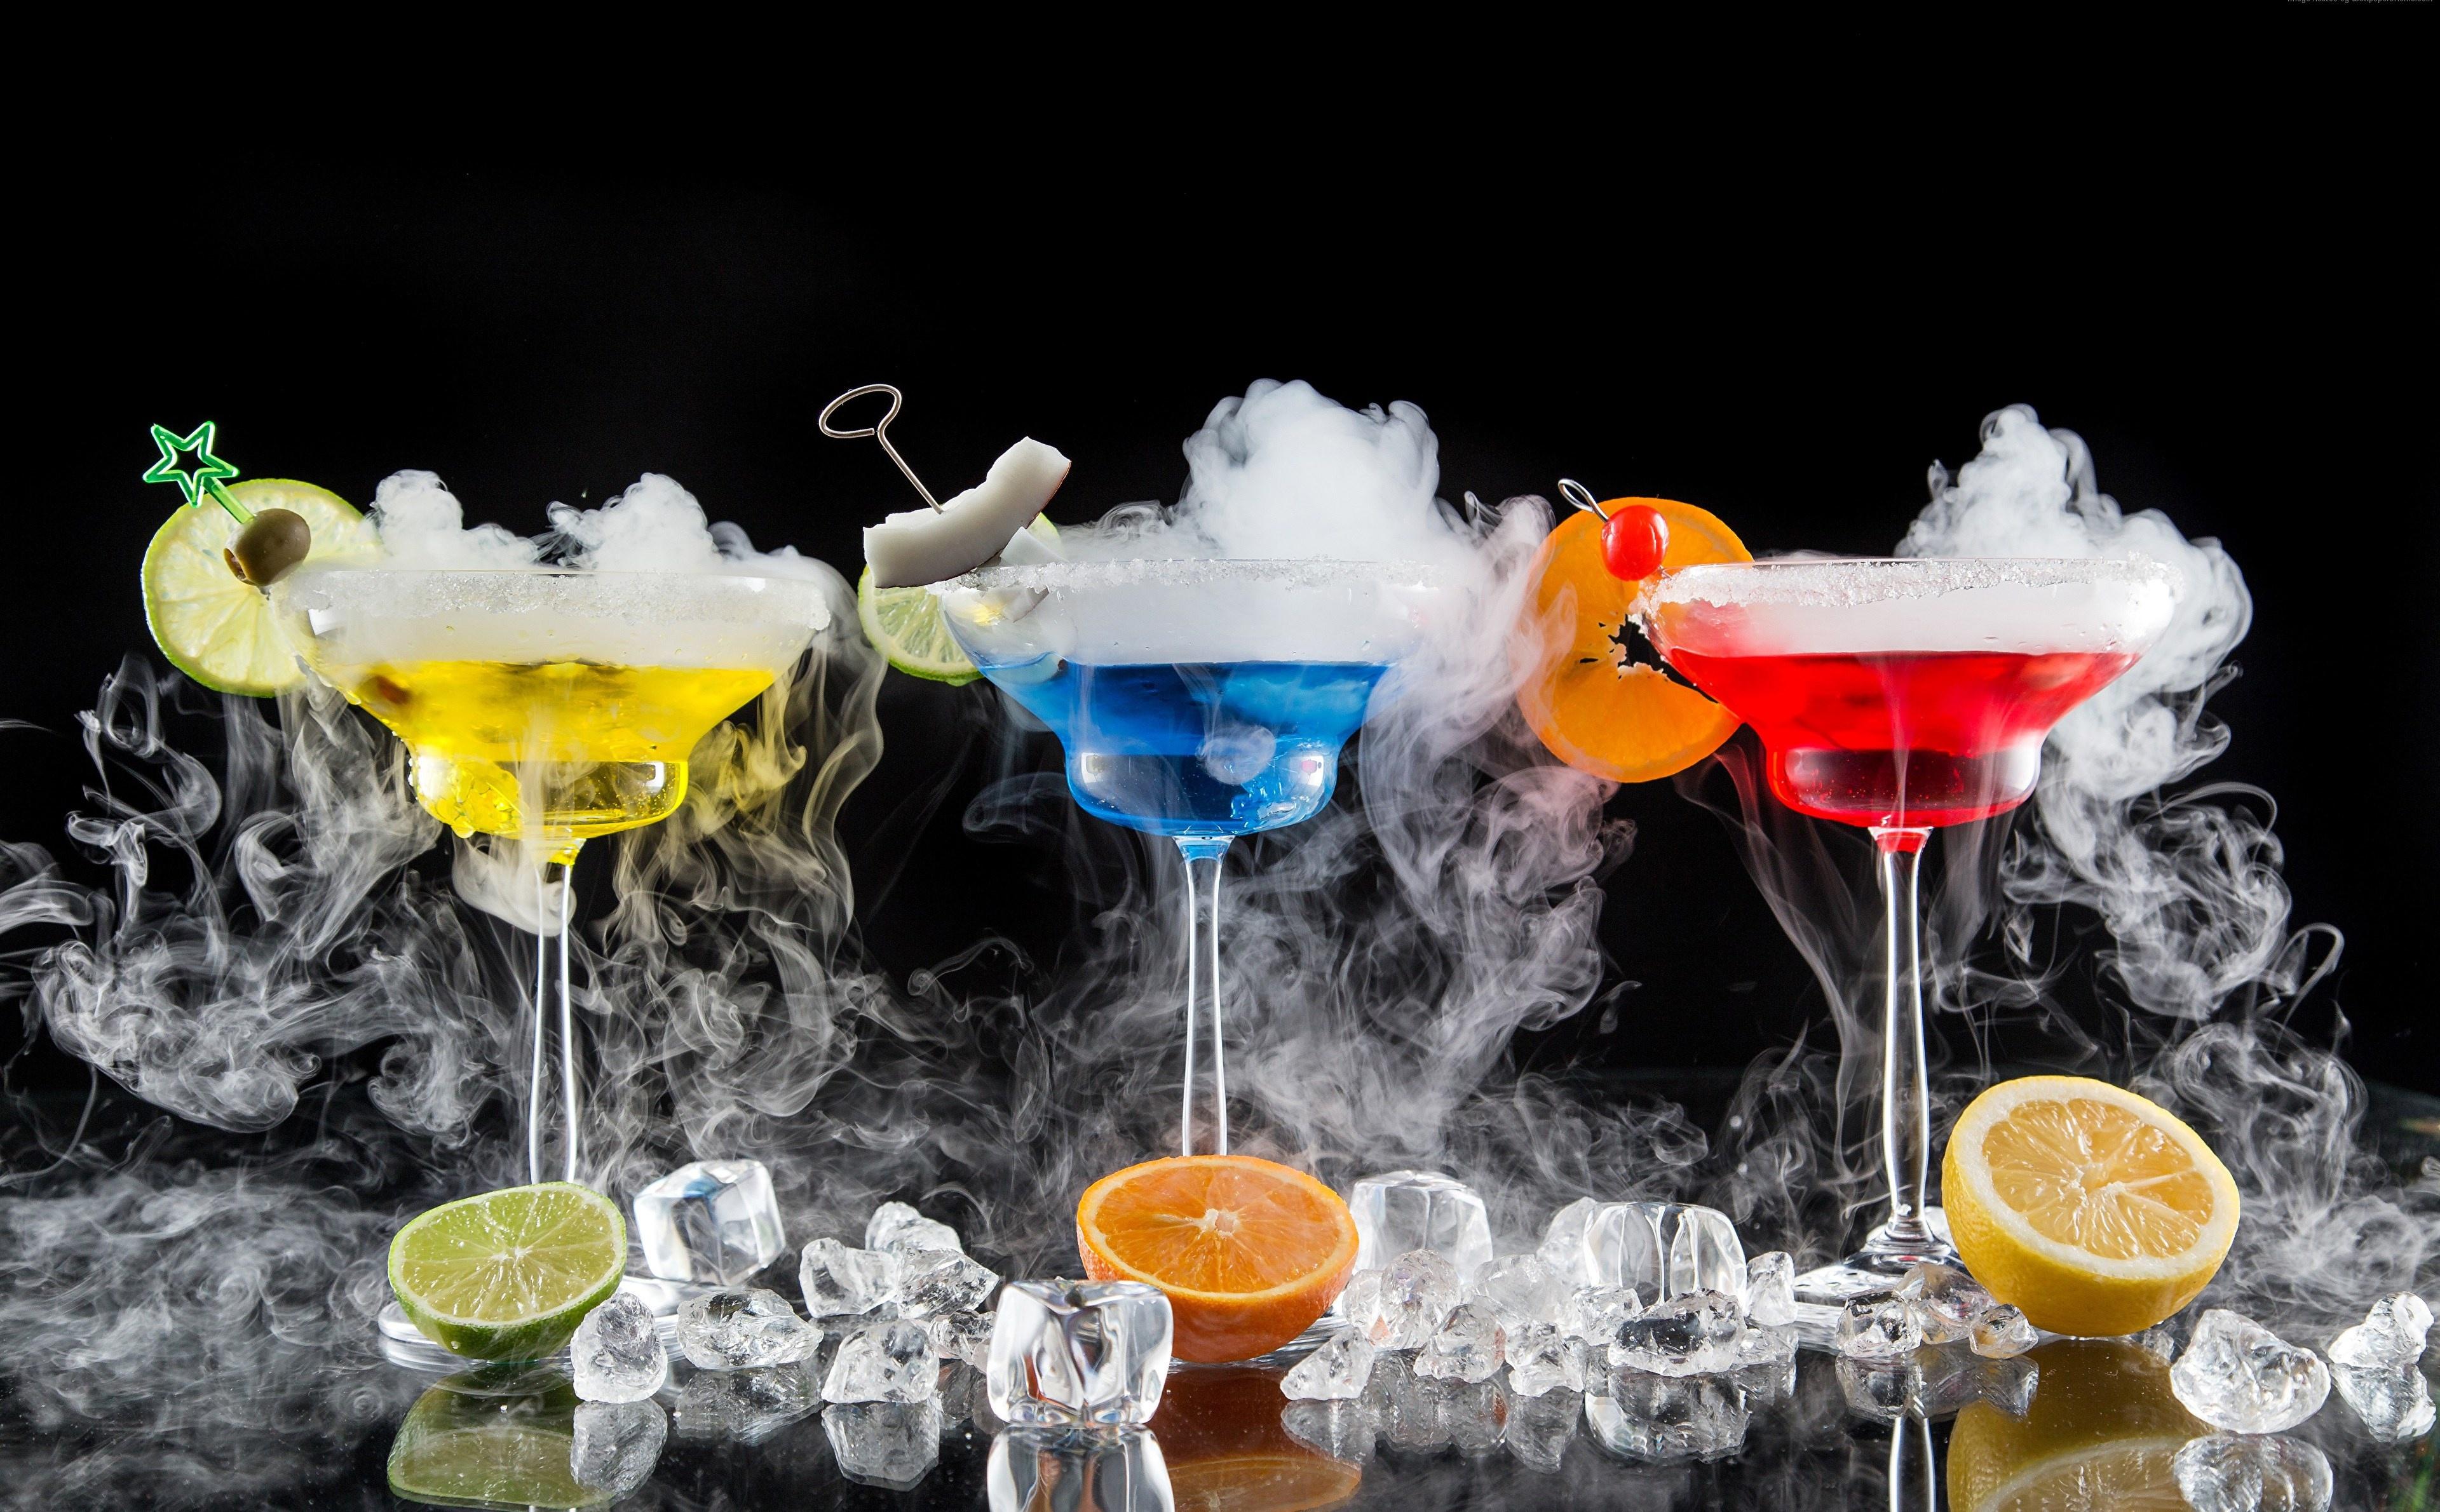 Cocktail 4k Ultra HD Wallpaper